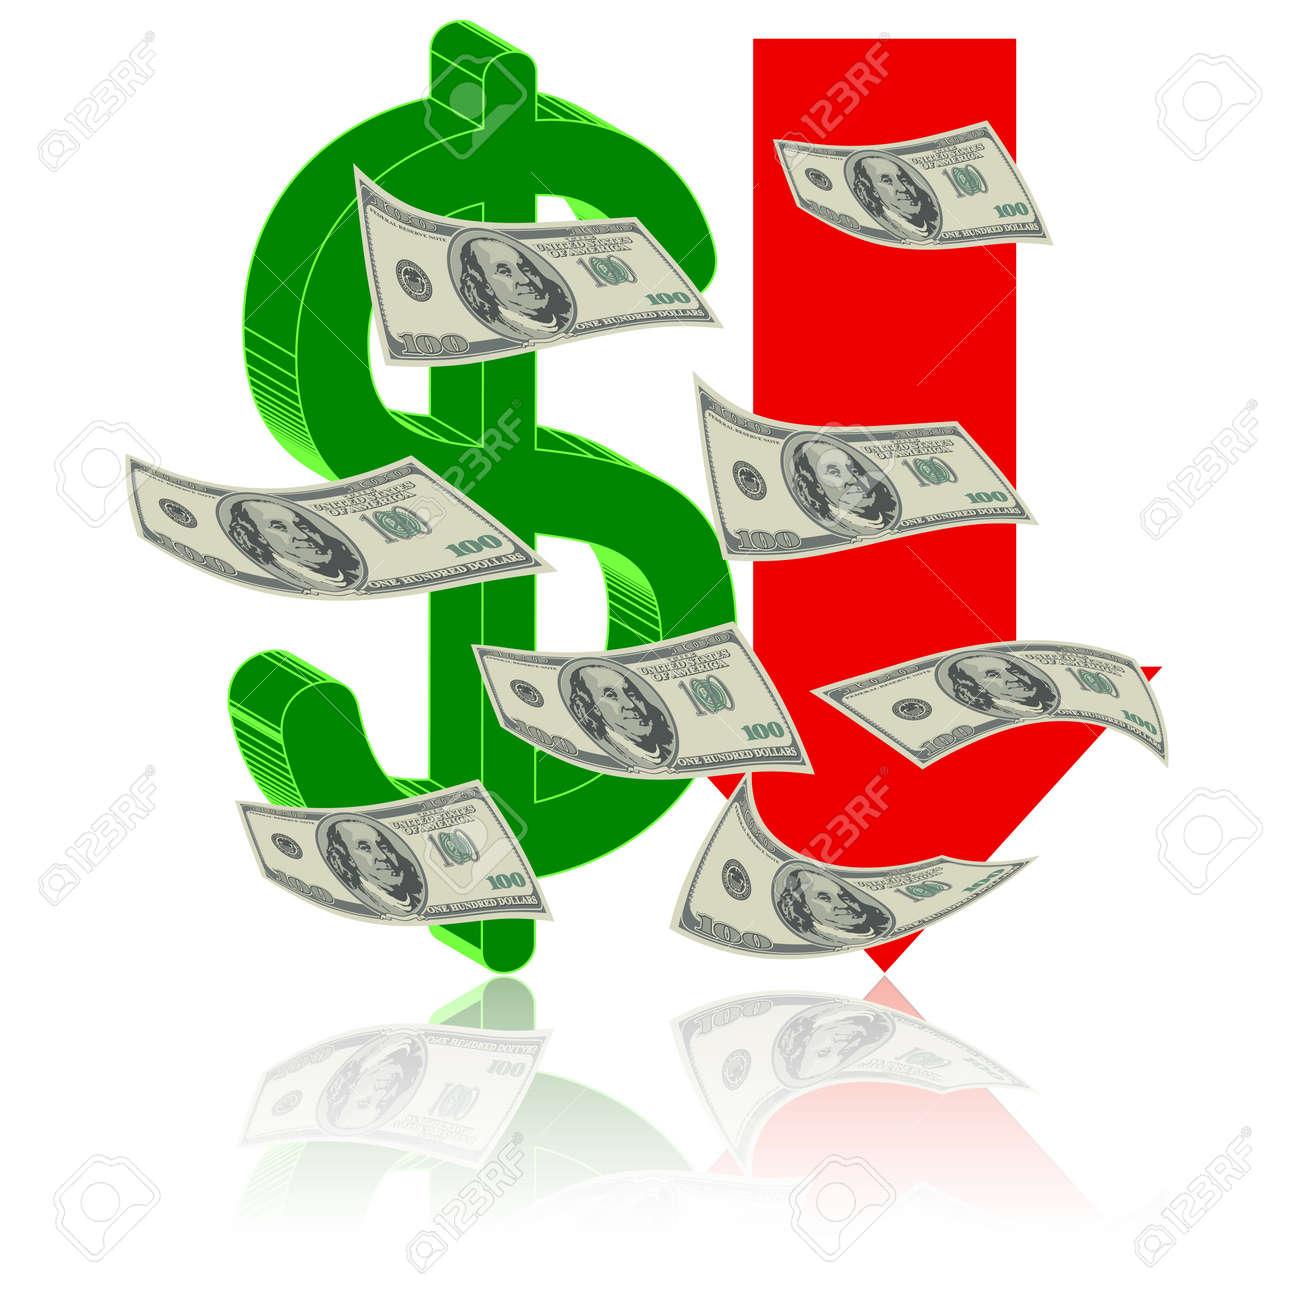 Crisis finance - the dollar symbol  arrow downward - devaluation money - symbolizing the bankruptcy or devaluation of money Stock Vector - 14375180